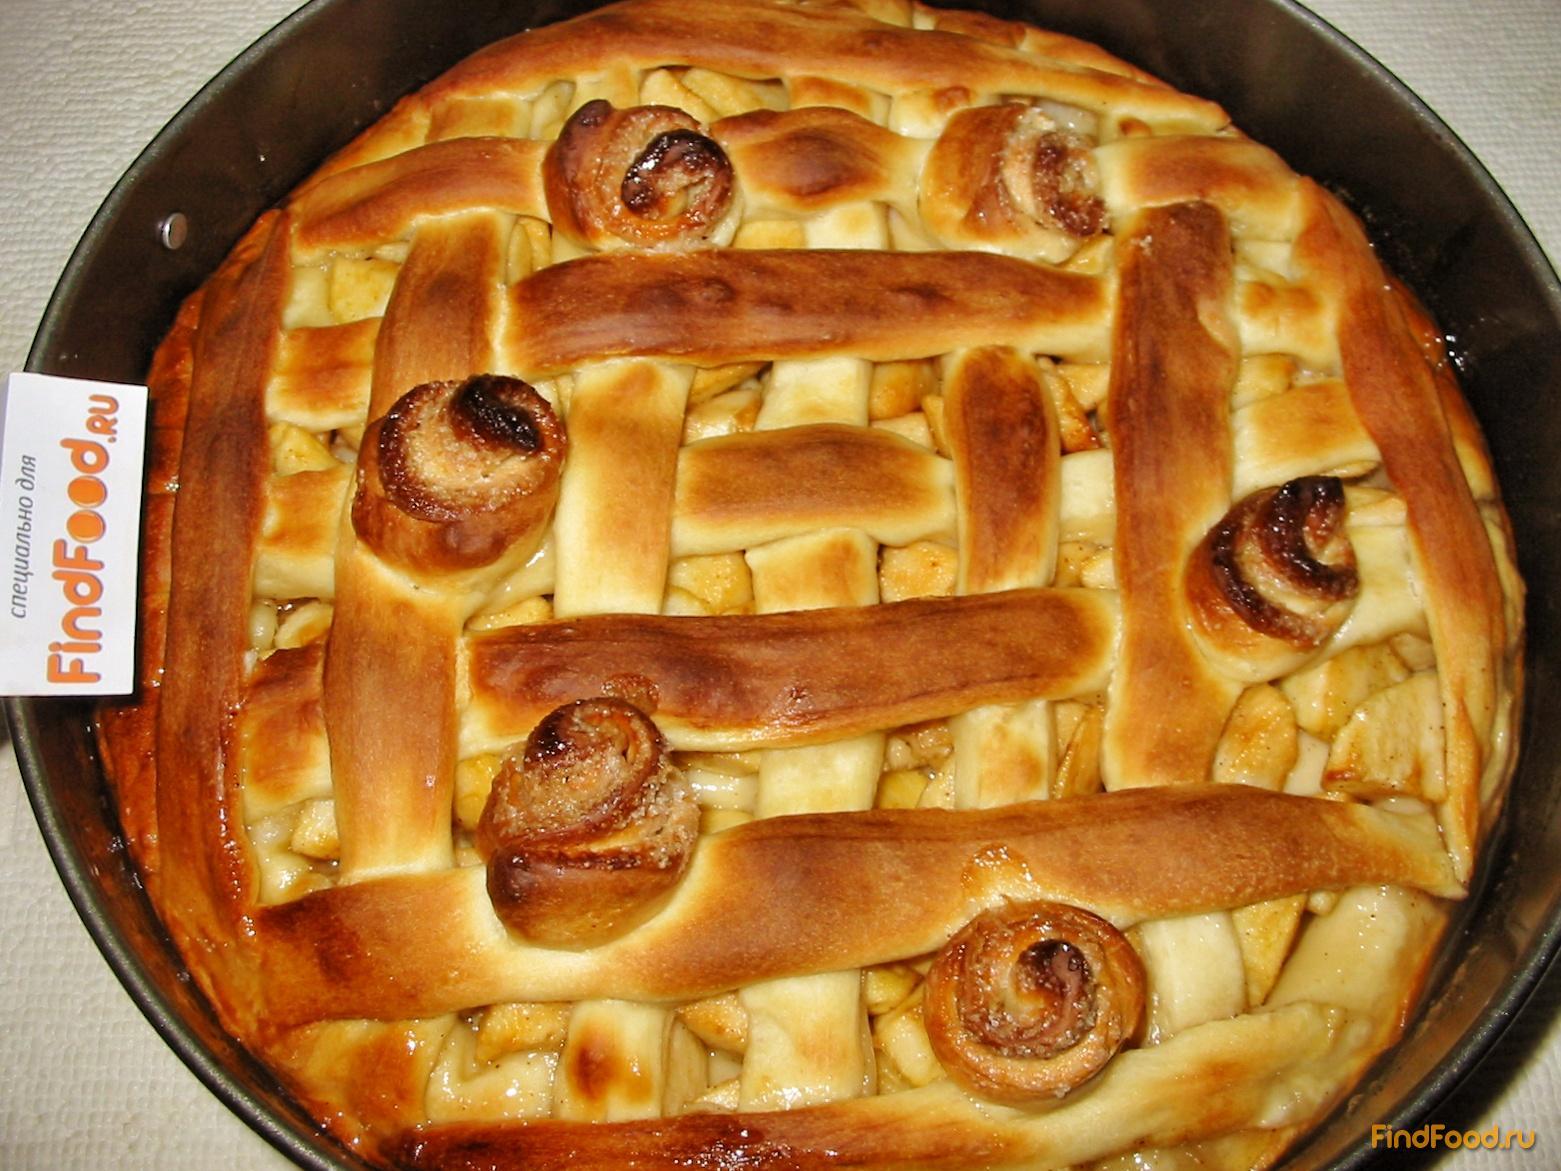 Яблоки пирог дрожжевое тесто рецепт пошагово